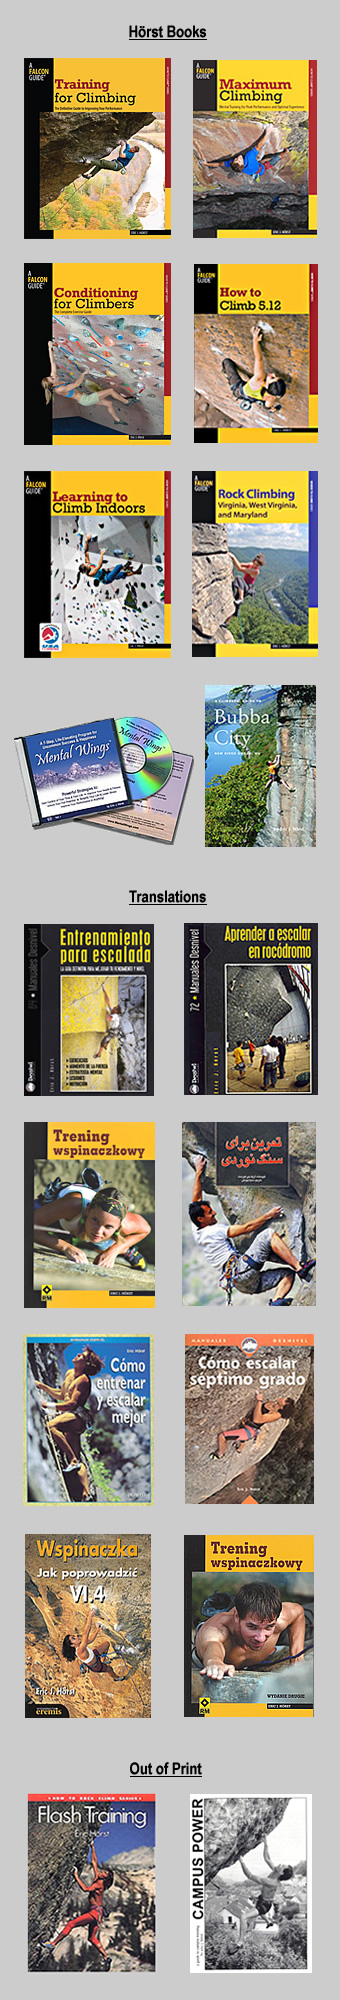 Books-sidebar2000-02042015